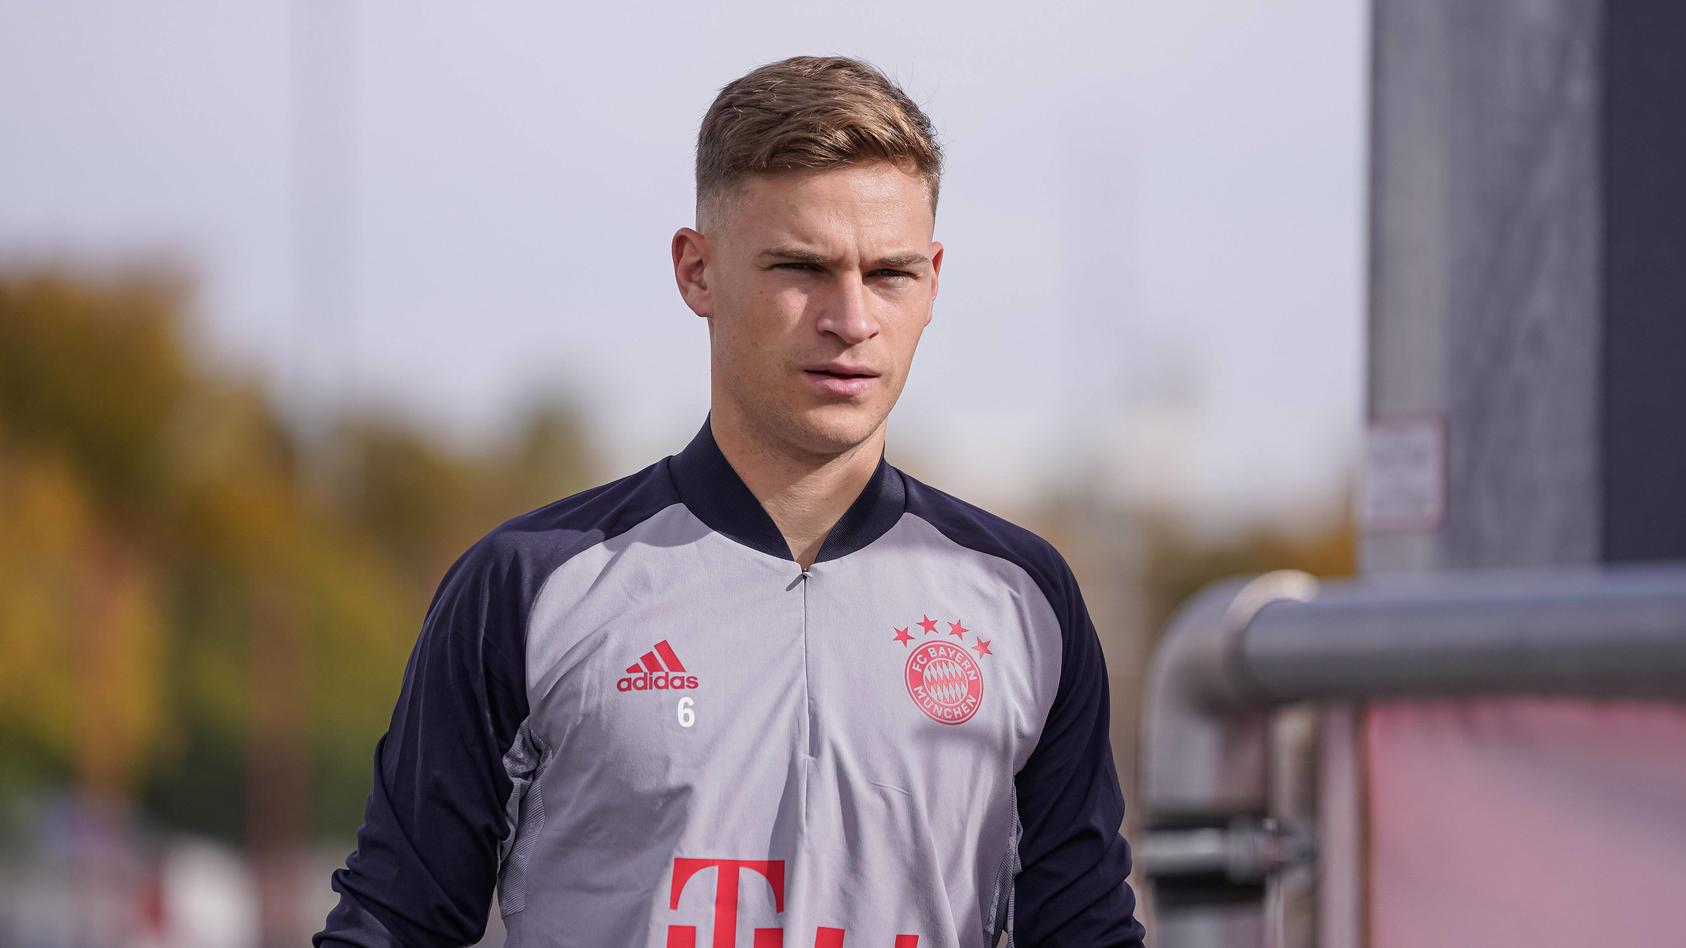 Joshua Kimmich im Trainingsdress des FC Bayern München.